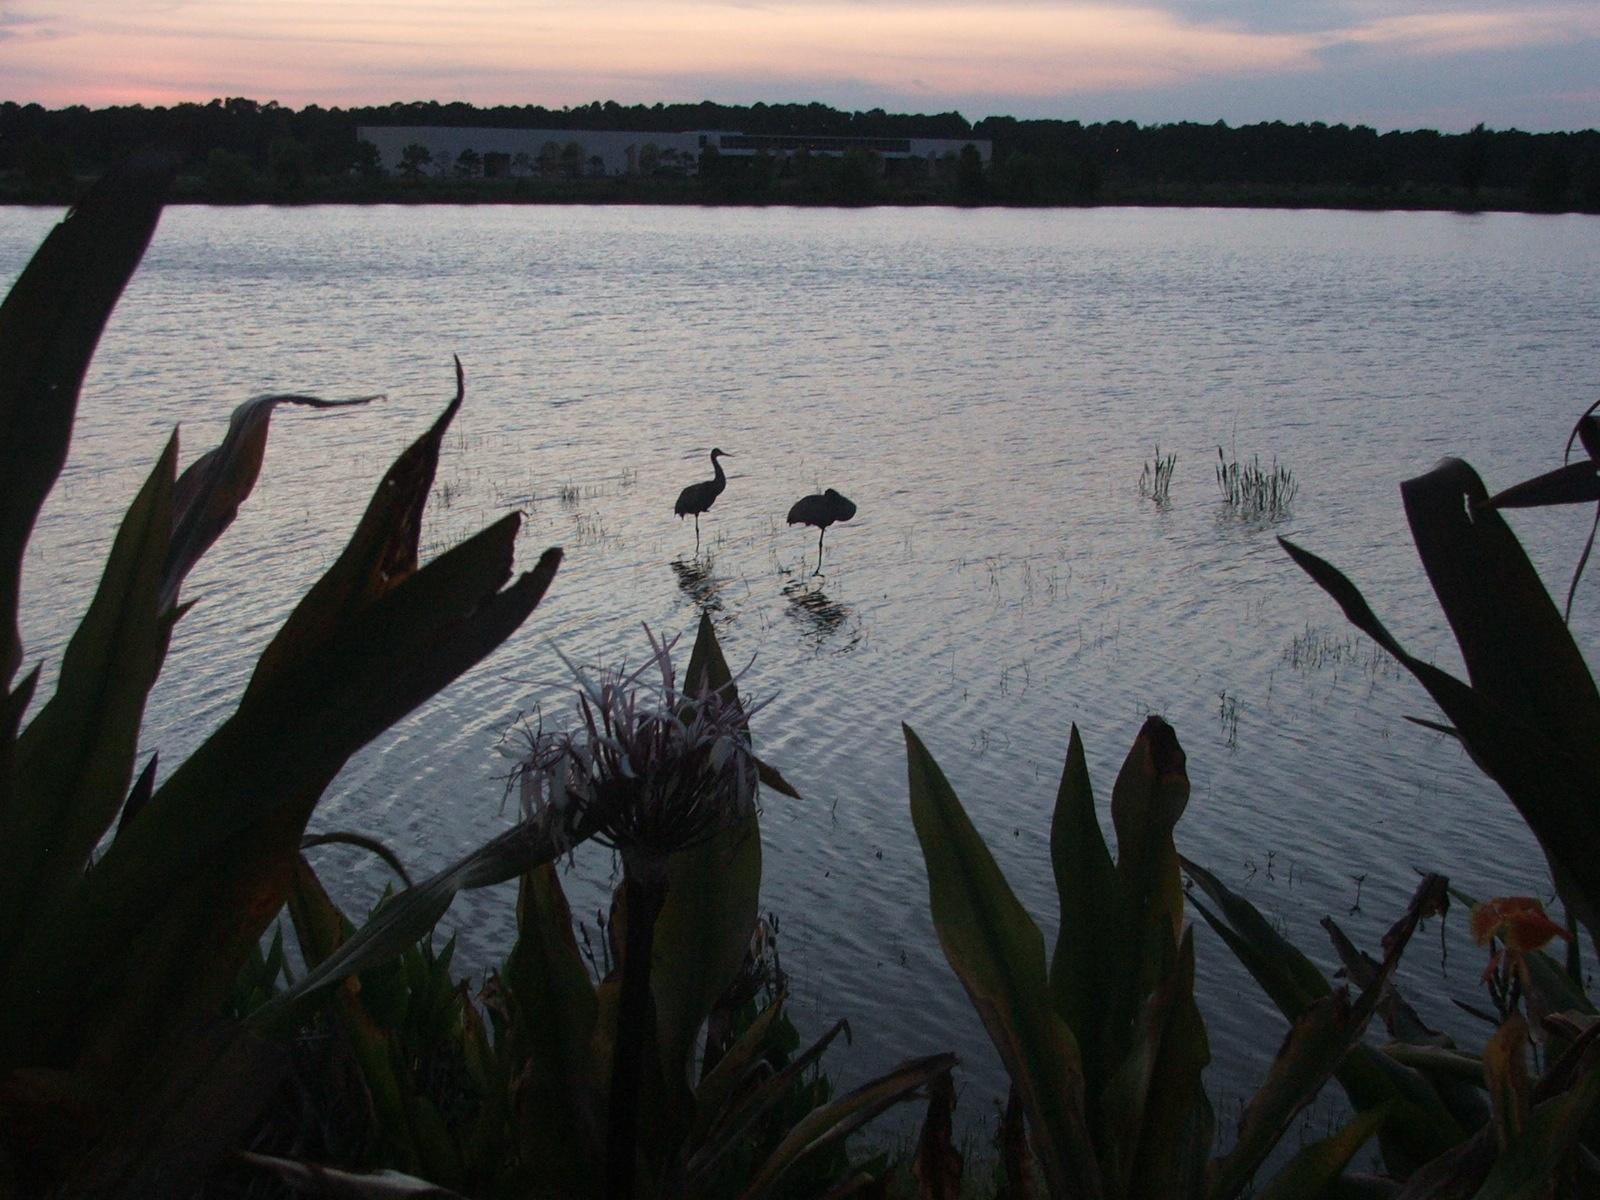 Storks at dusk by F J Bering